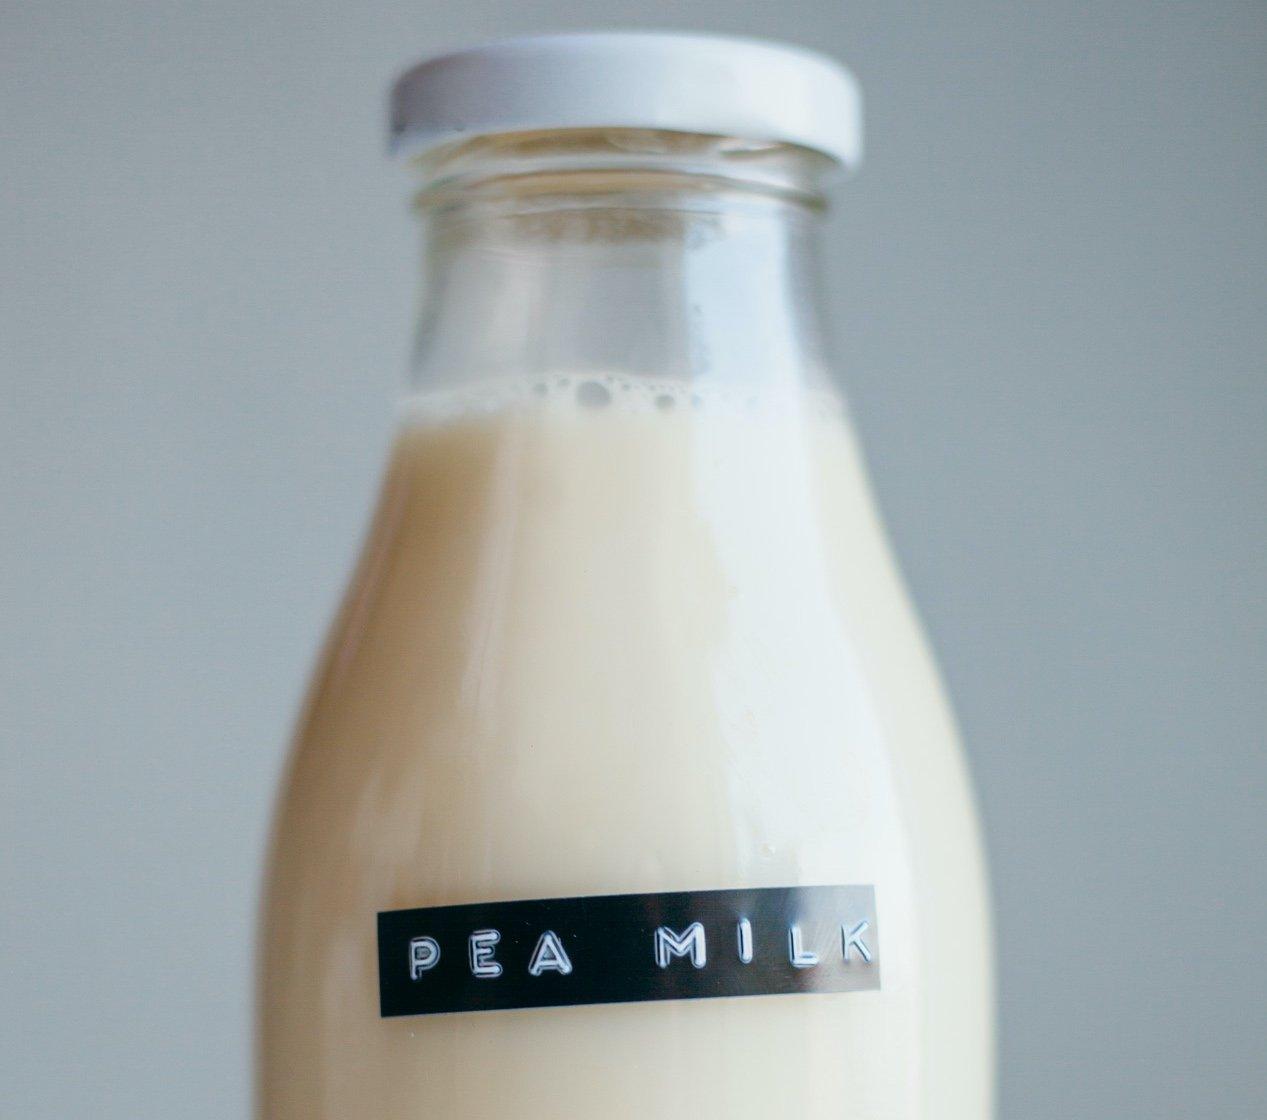 Plant-Based Milk Has A New Contender: Meet Pea Milk